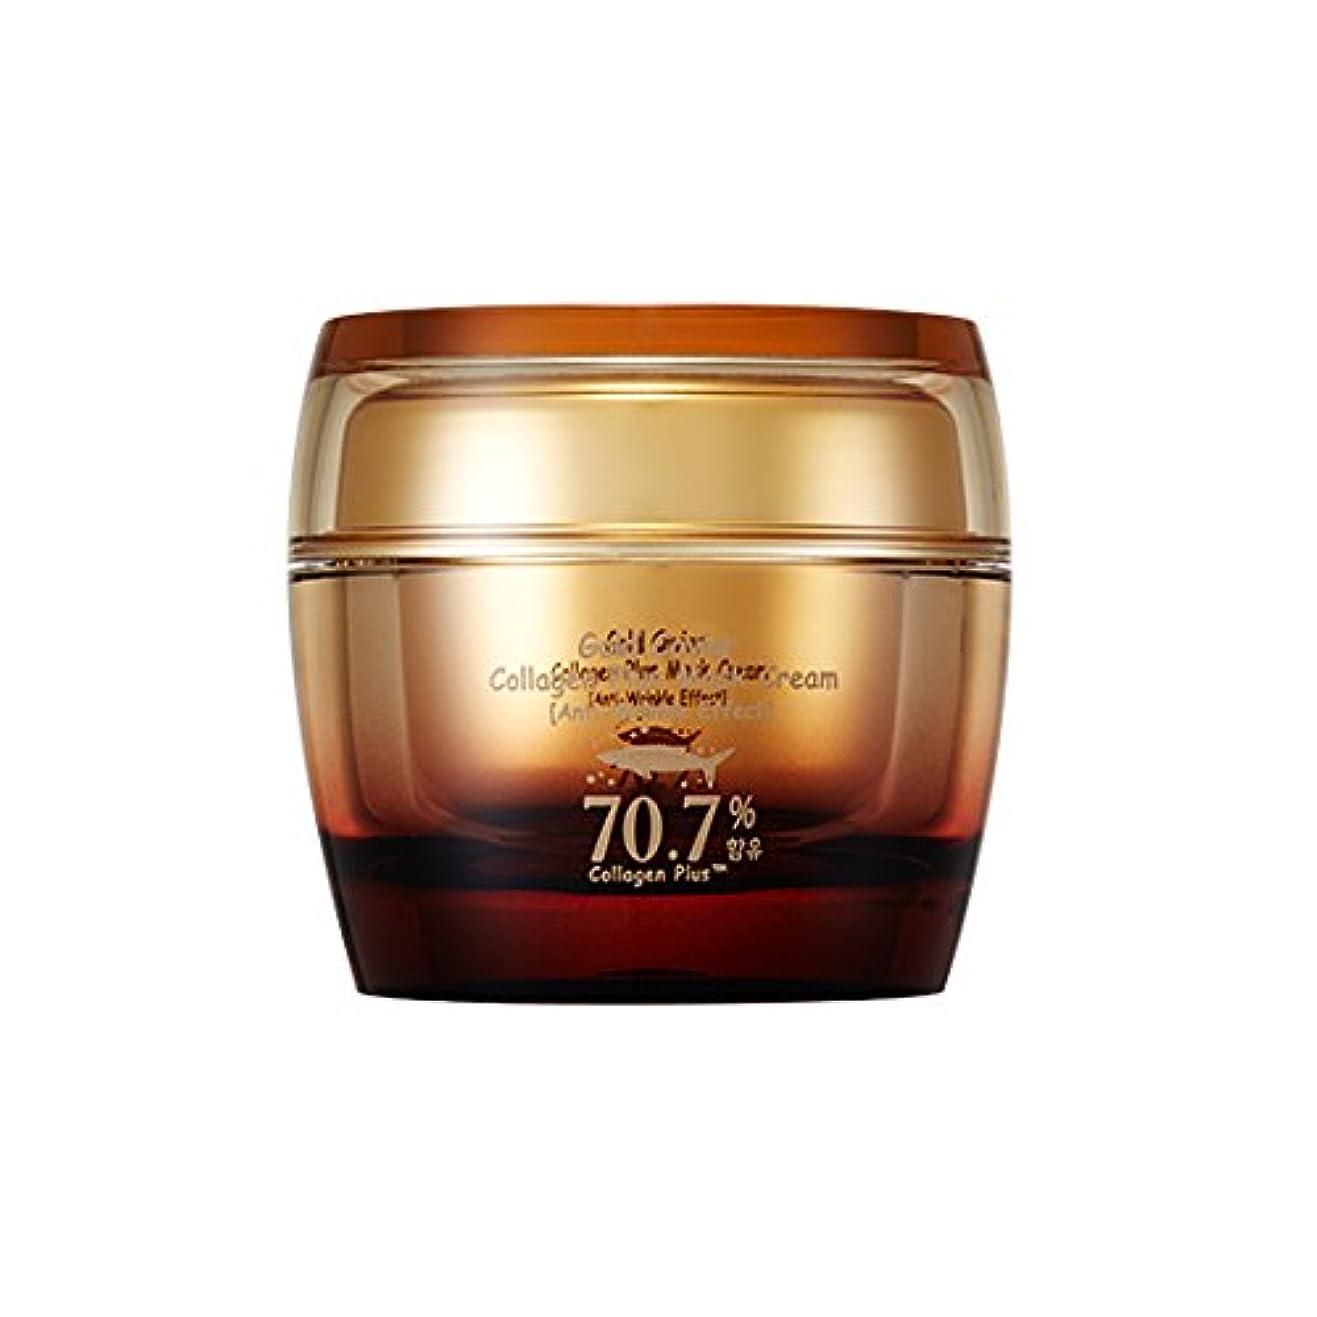 Skinfood ゴールドキャビアコラーゲンプラスクリーム(しわ防止効果) / Gold Caviar Collagen Plus Cream (Anti-Wrinkle Effect) 50g [並行輸入品]